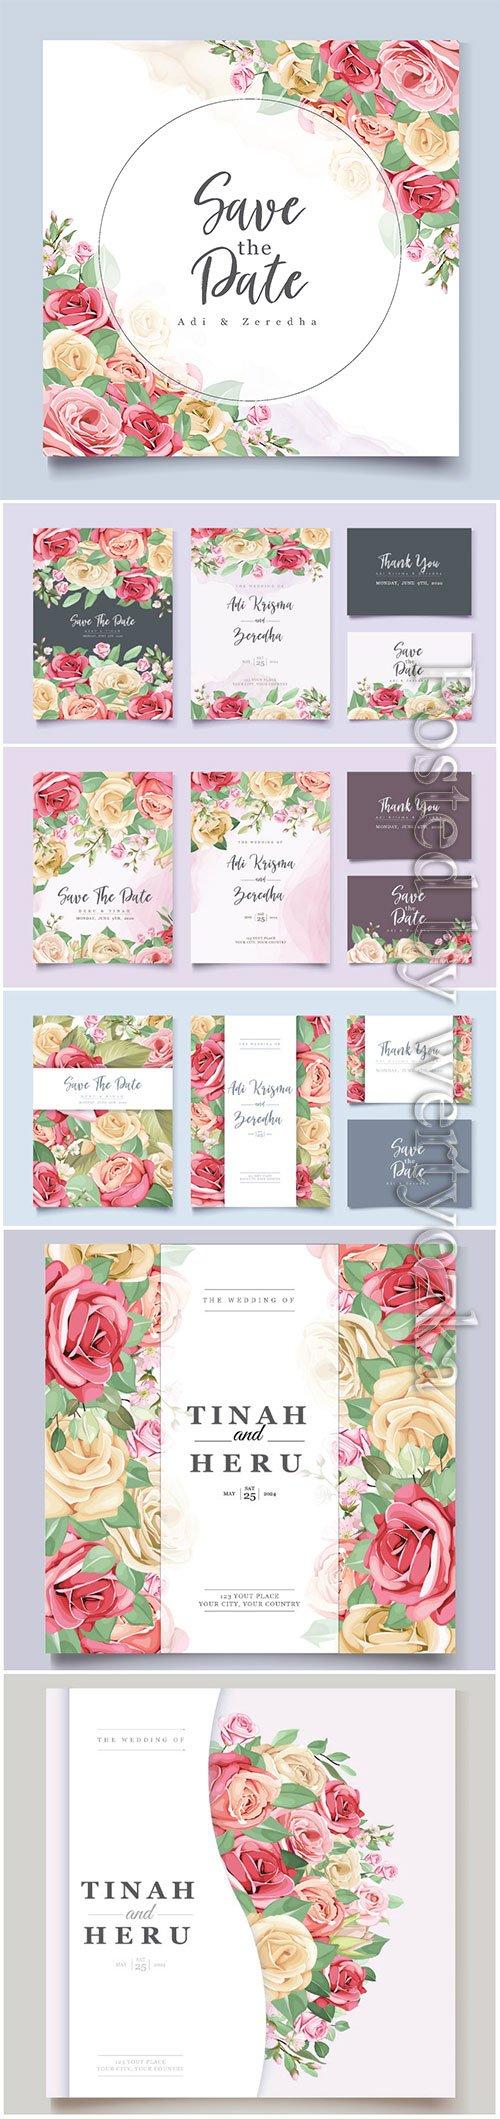 Elegant floral and leaves wedding invitation vector designs